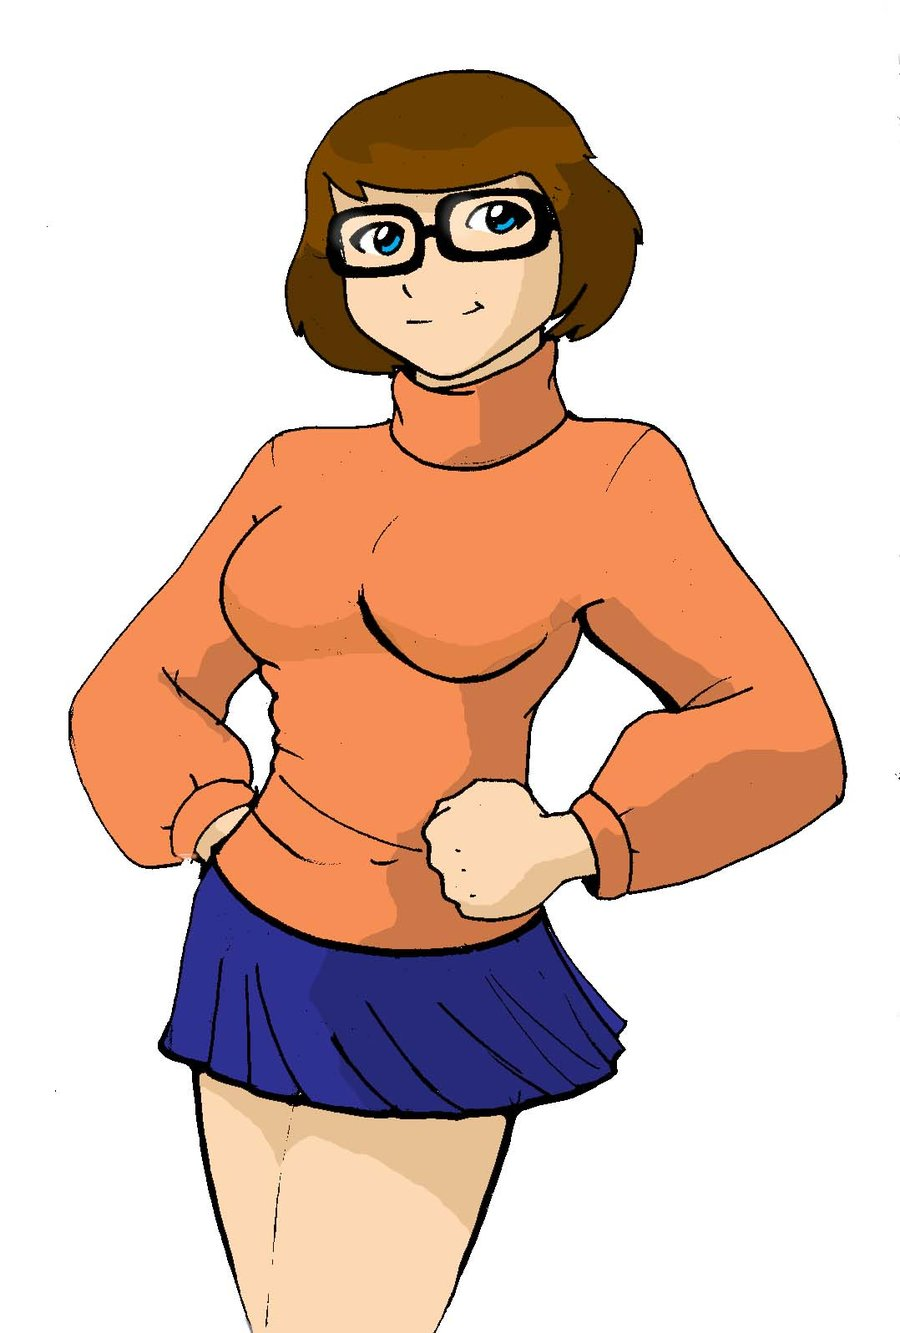 Velma Dinkley Scoodby Doo Cartoon Wallpaper-4141